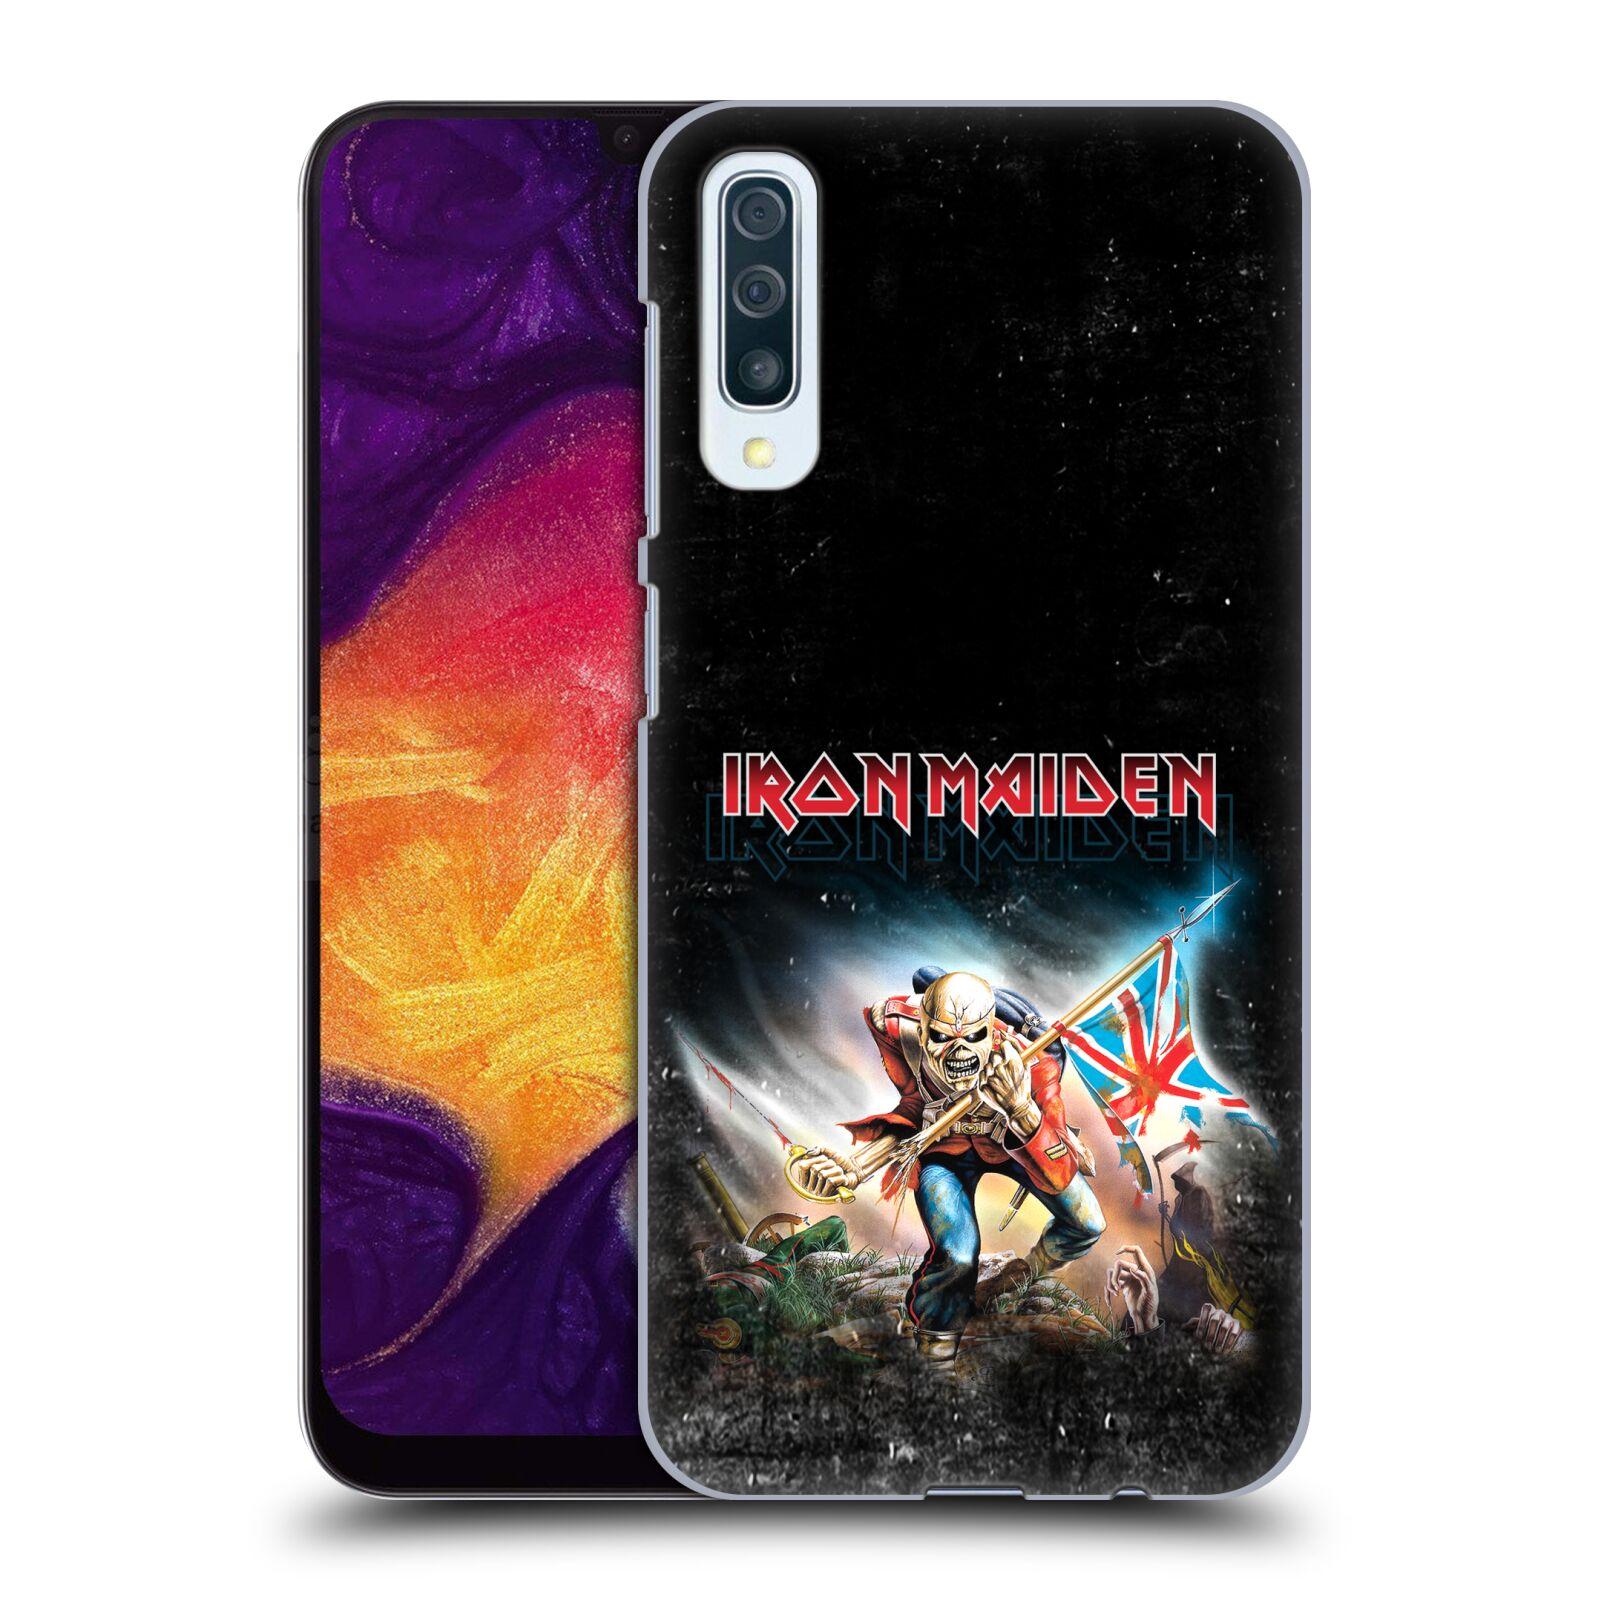 Plastové pouzdro na mobil Samsung Galaxy A50 / A30s - Head Case - Iron Maiden - Trooper 2016